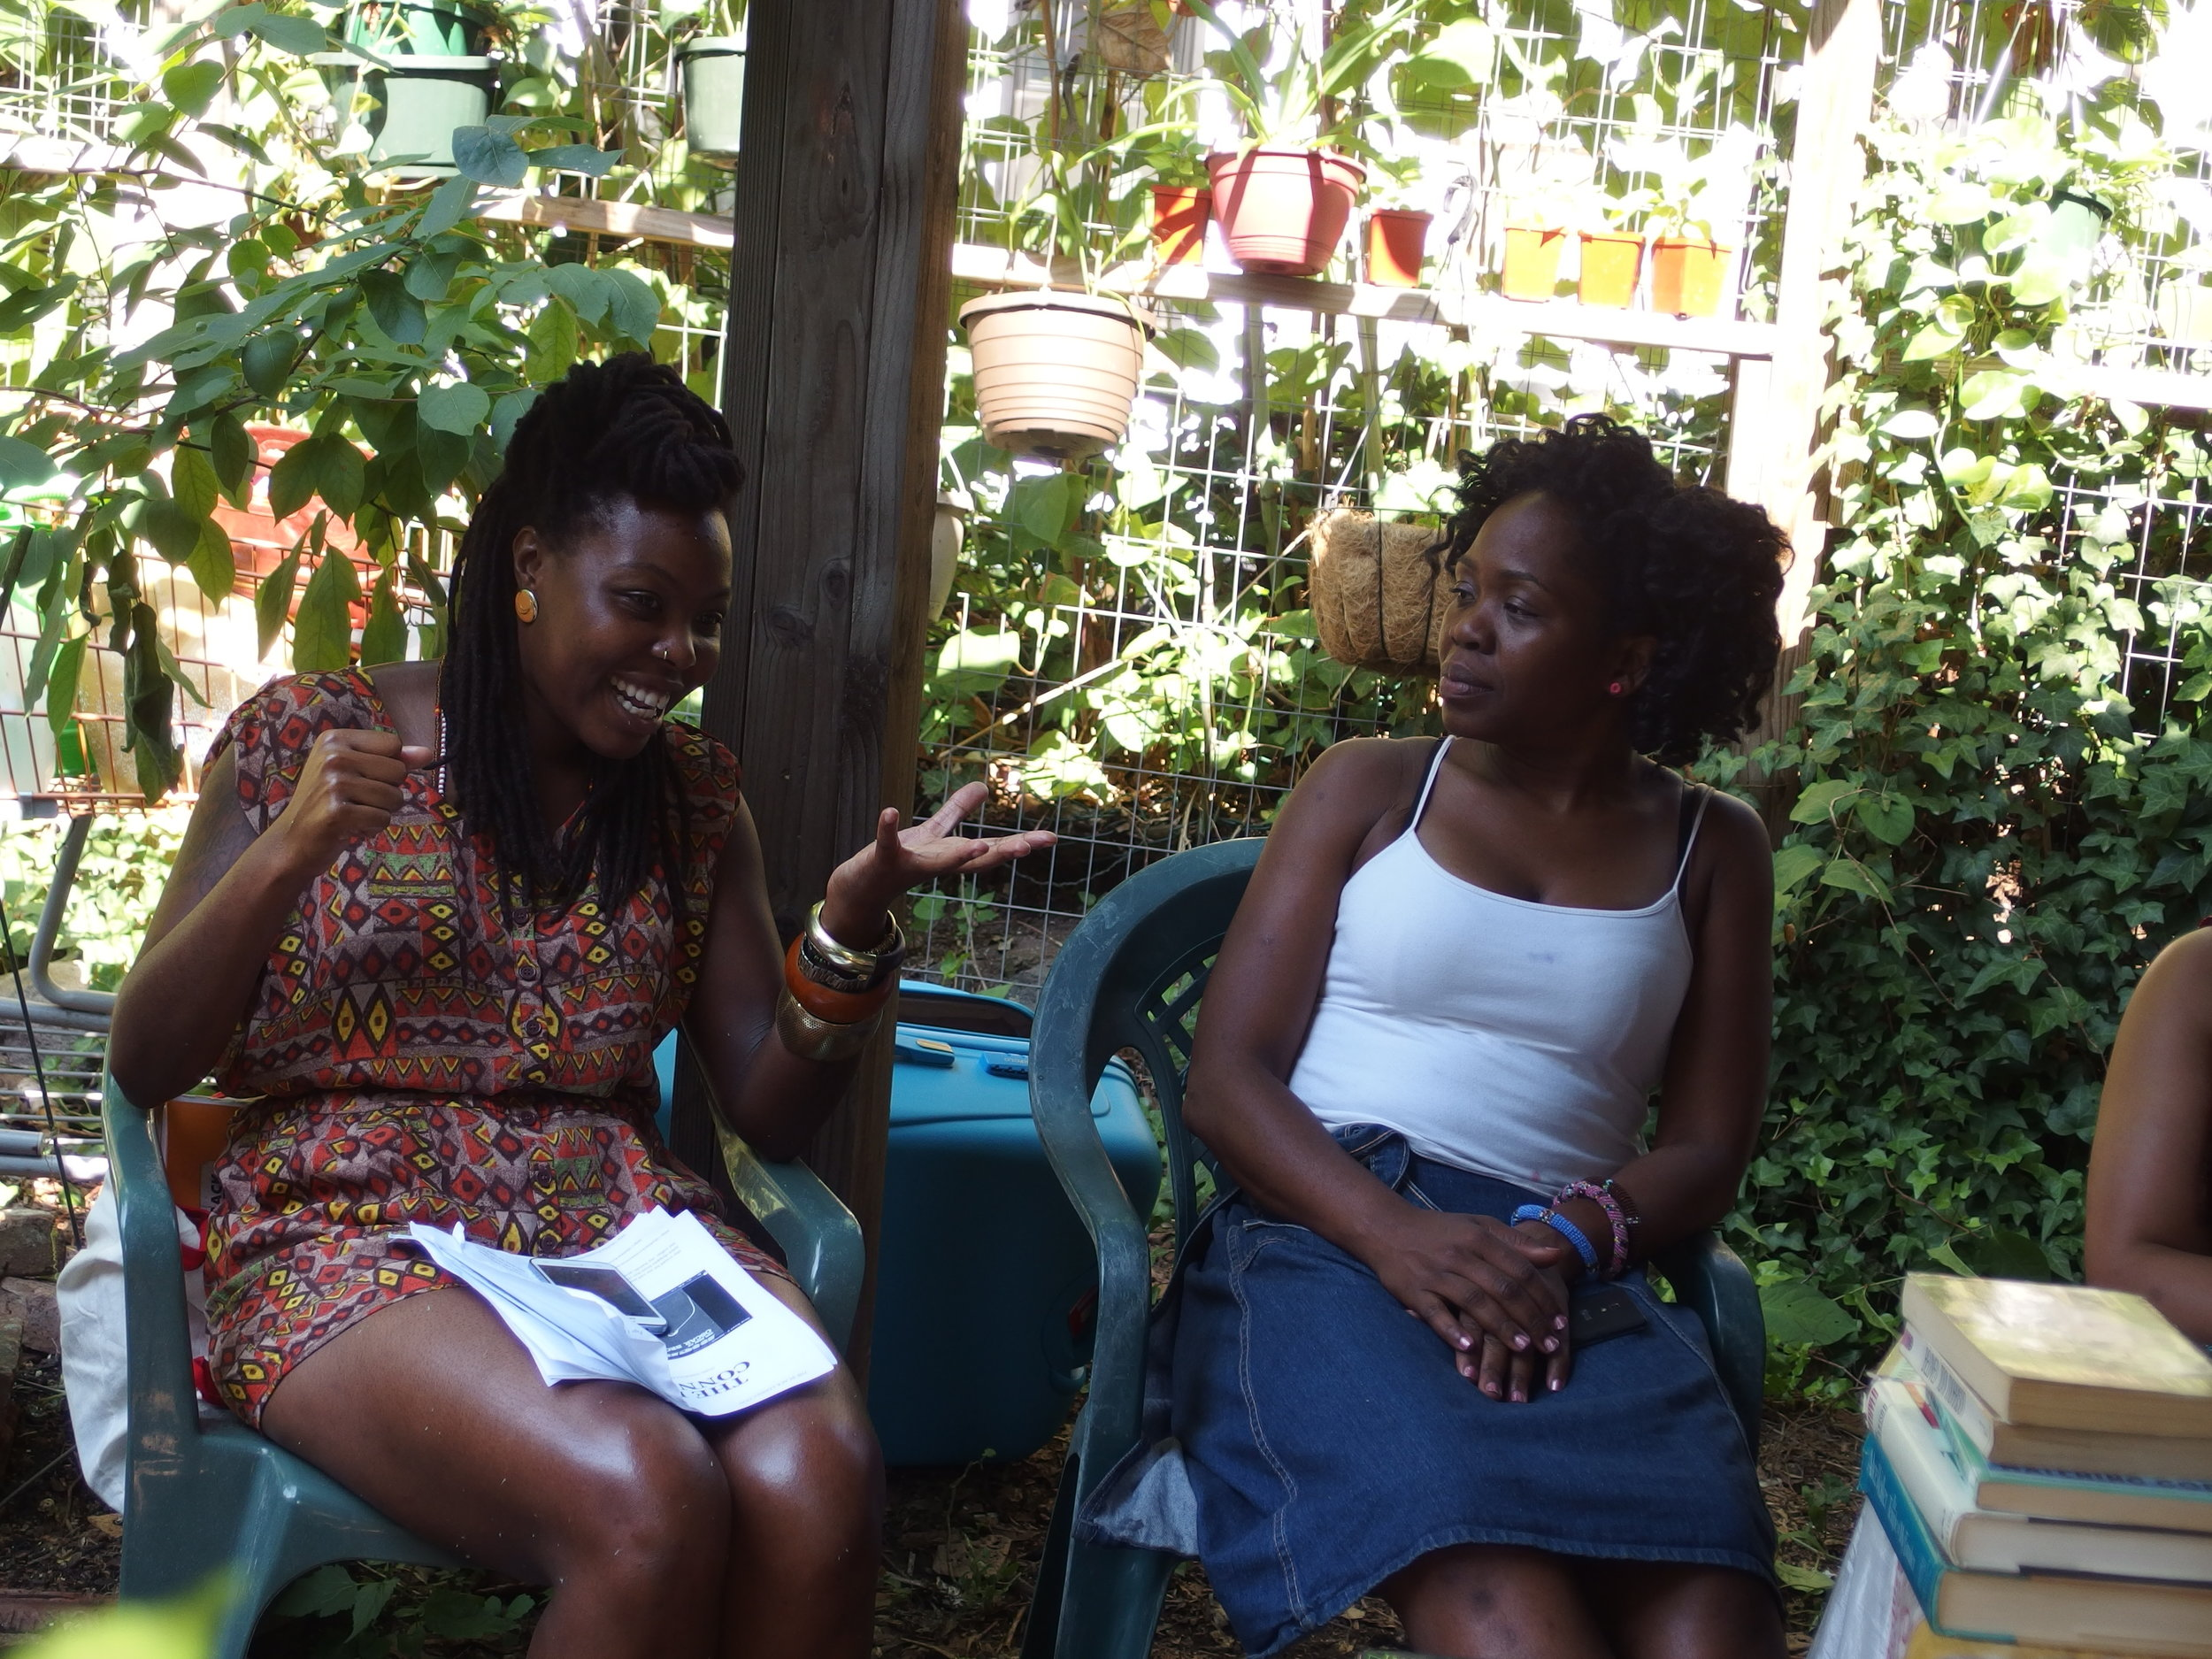 little-free-black-womens-library_20924862296_o.jpg